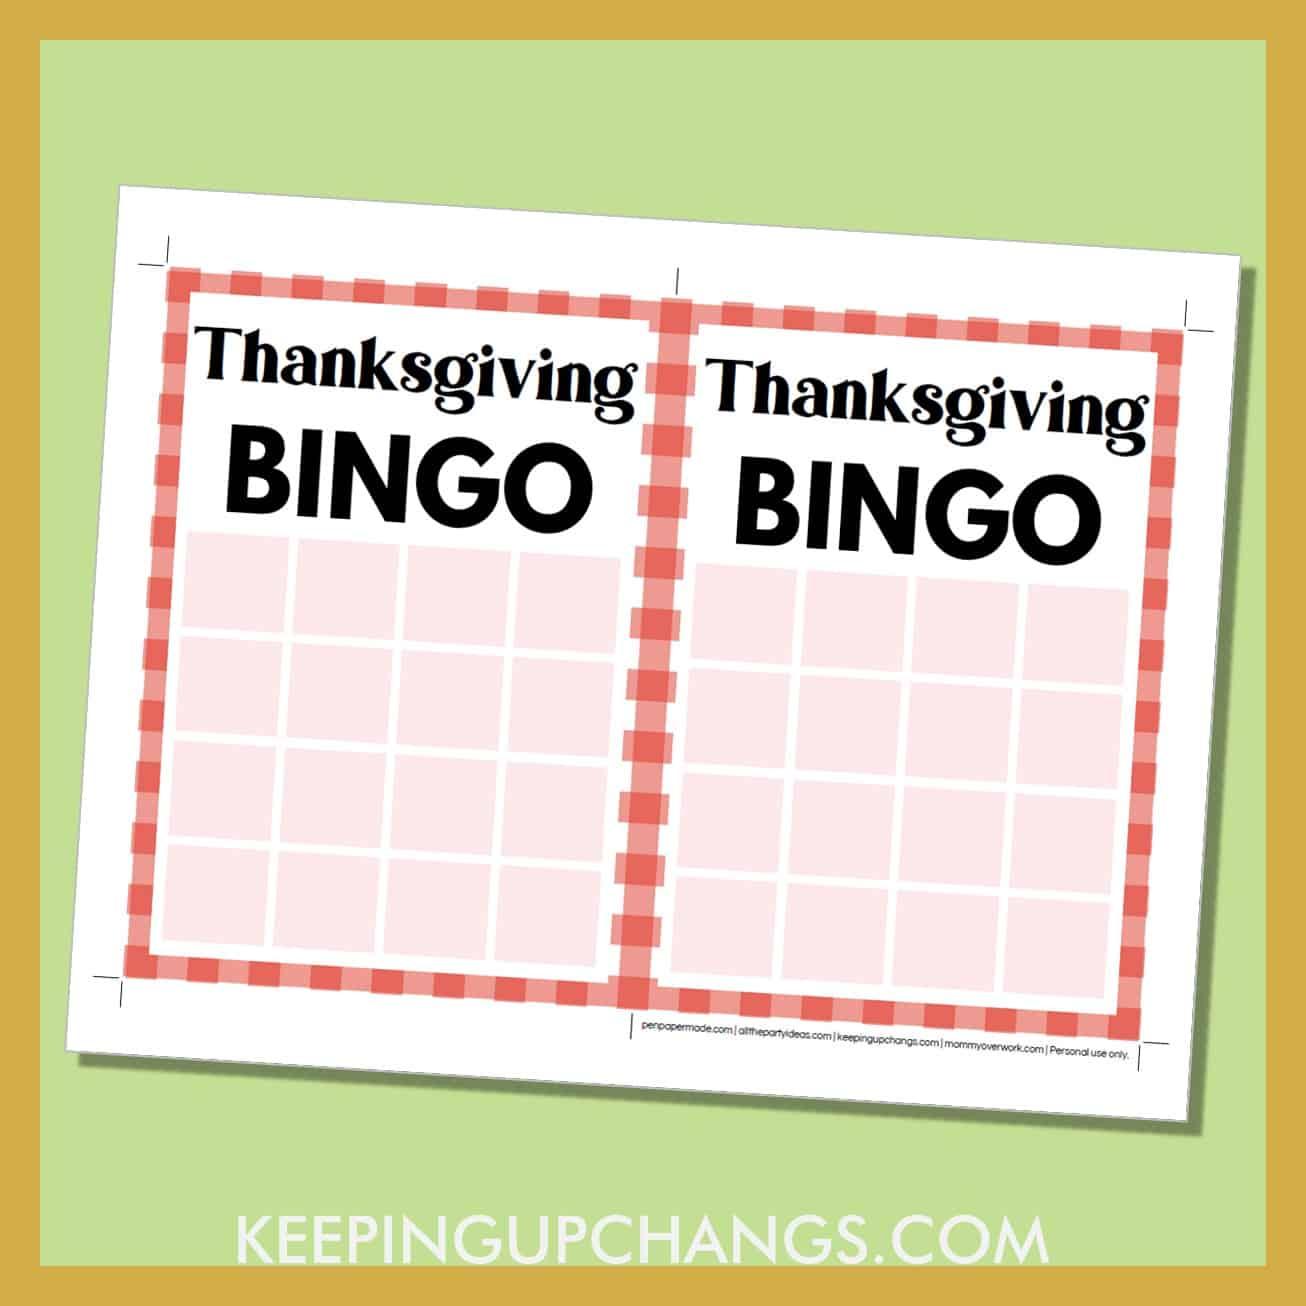 free thanksgiving bingo 4x4 grid game board blank template.